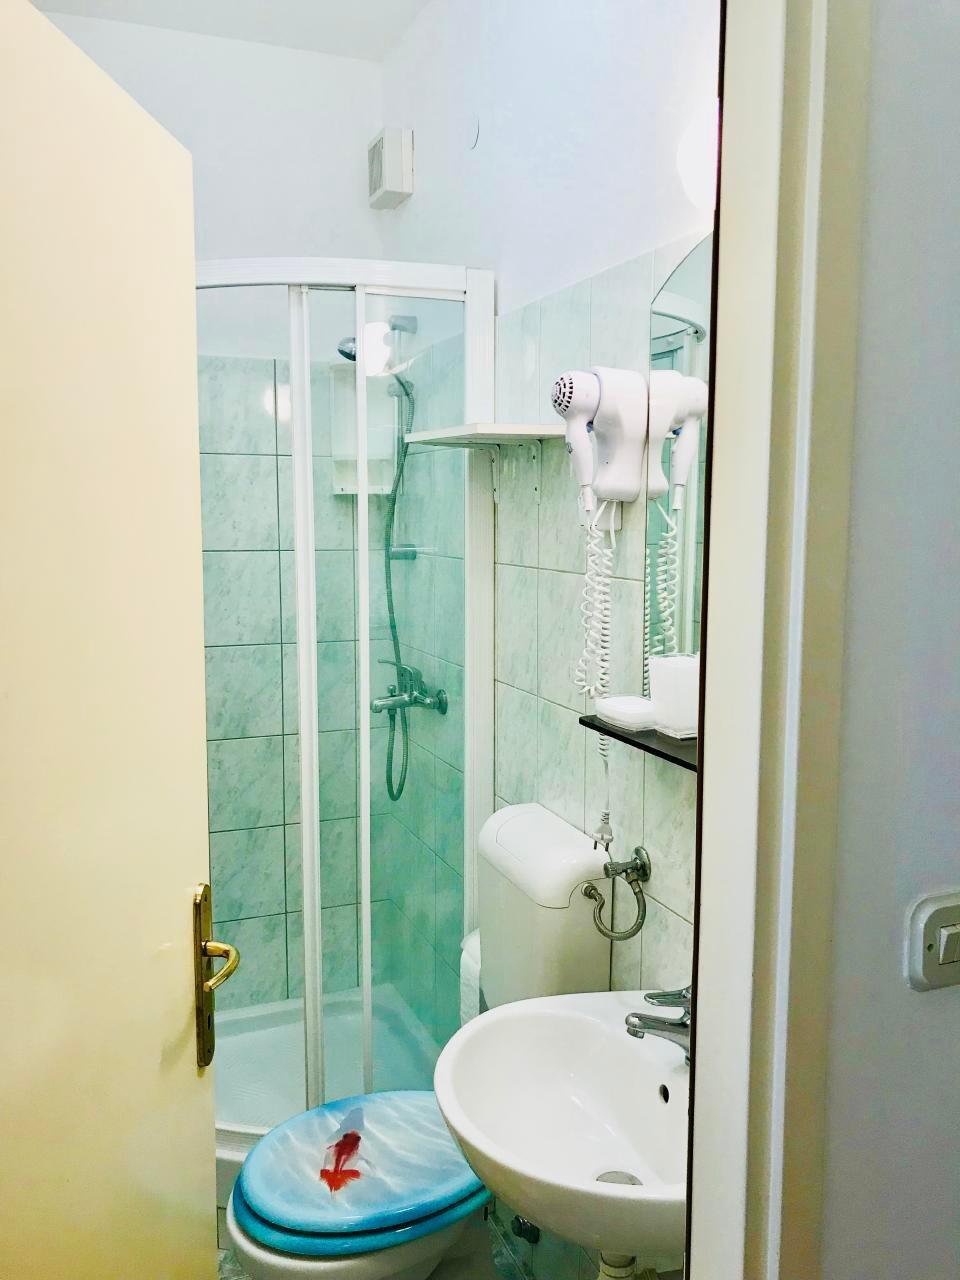 Ferienwohnung Apartmenthaus Ruza 4 - Studio (98392), Kaštel Štafilić, , Dalmatien, Kroatien, Bild 6